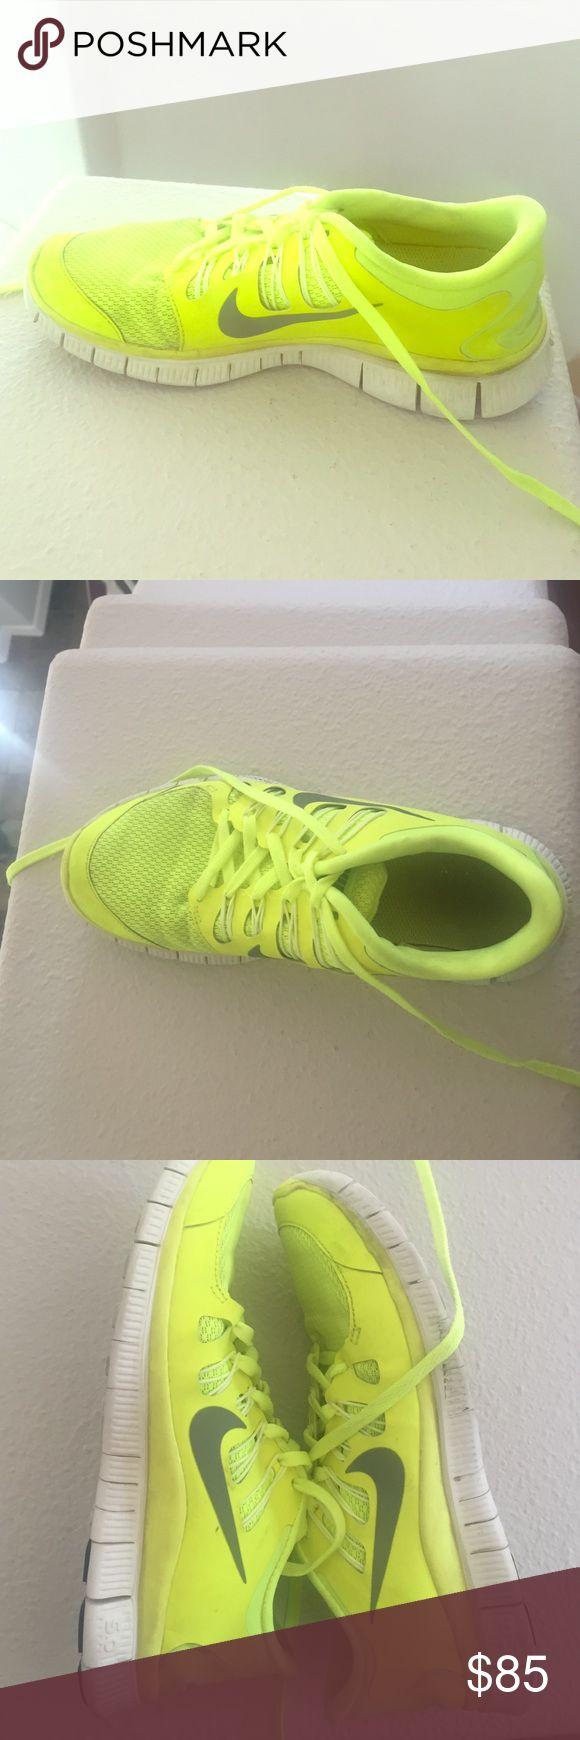 Nike free run 5.0 Neon nike free runs 5.0! Nike Shoes Athletic Shoes